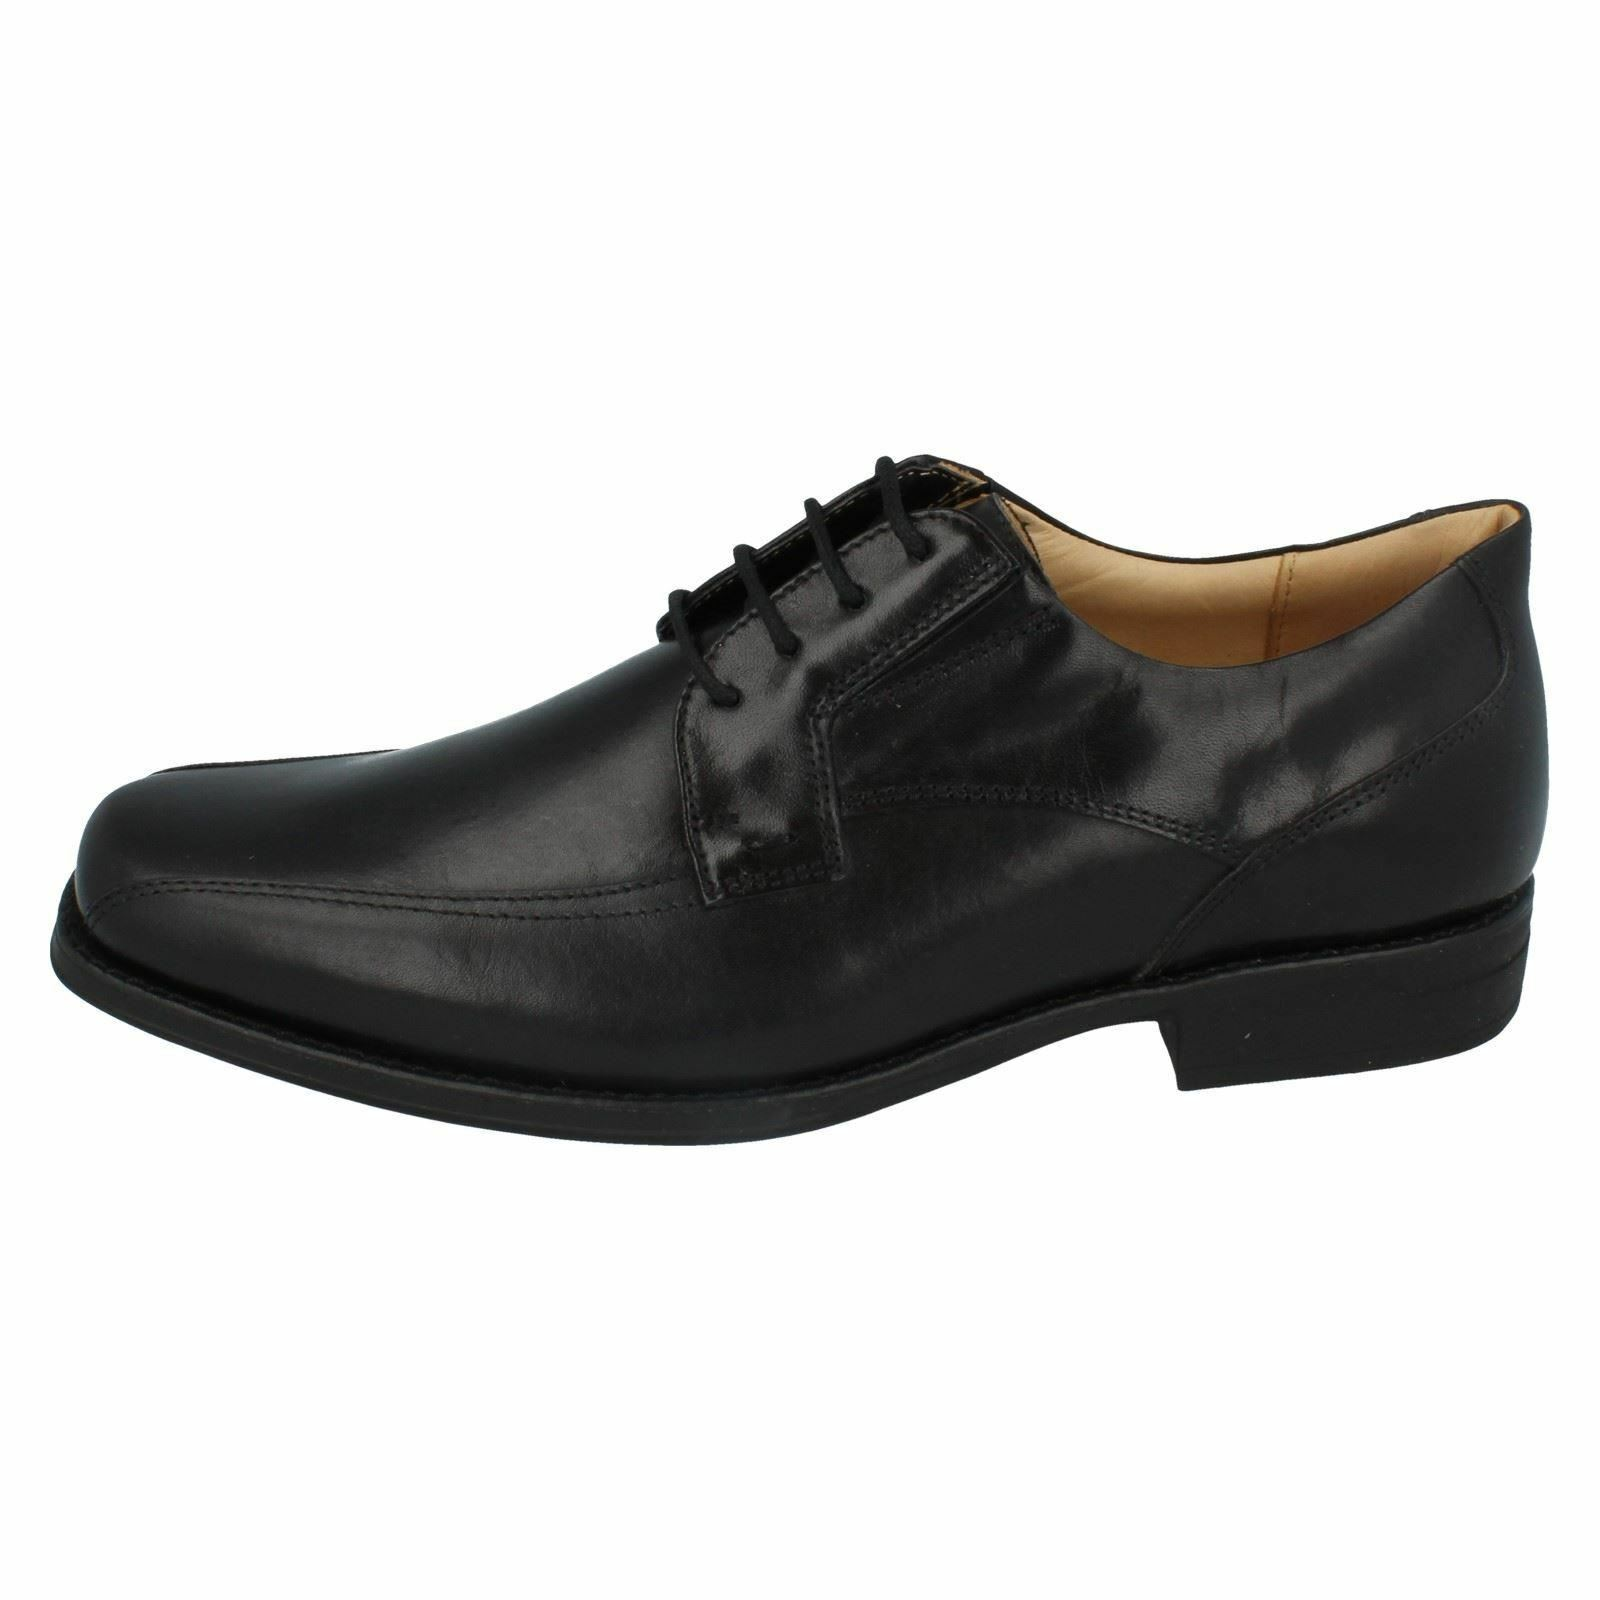 Mens Formoso schwarz Leder Formal Schuhes - by Anatomic & Co - Schuhes £79.00 6d0a95